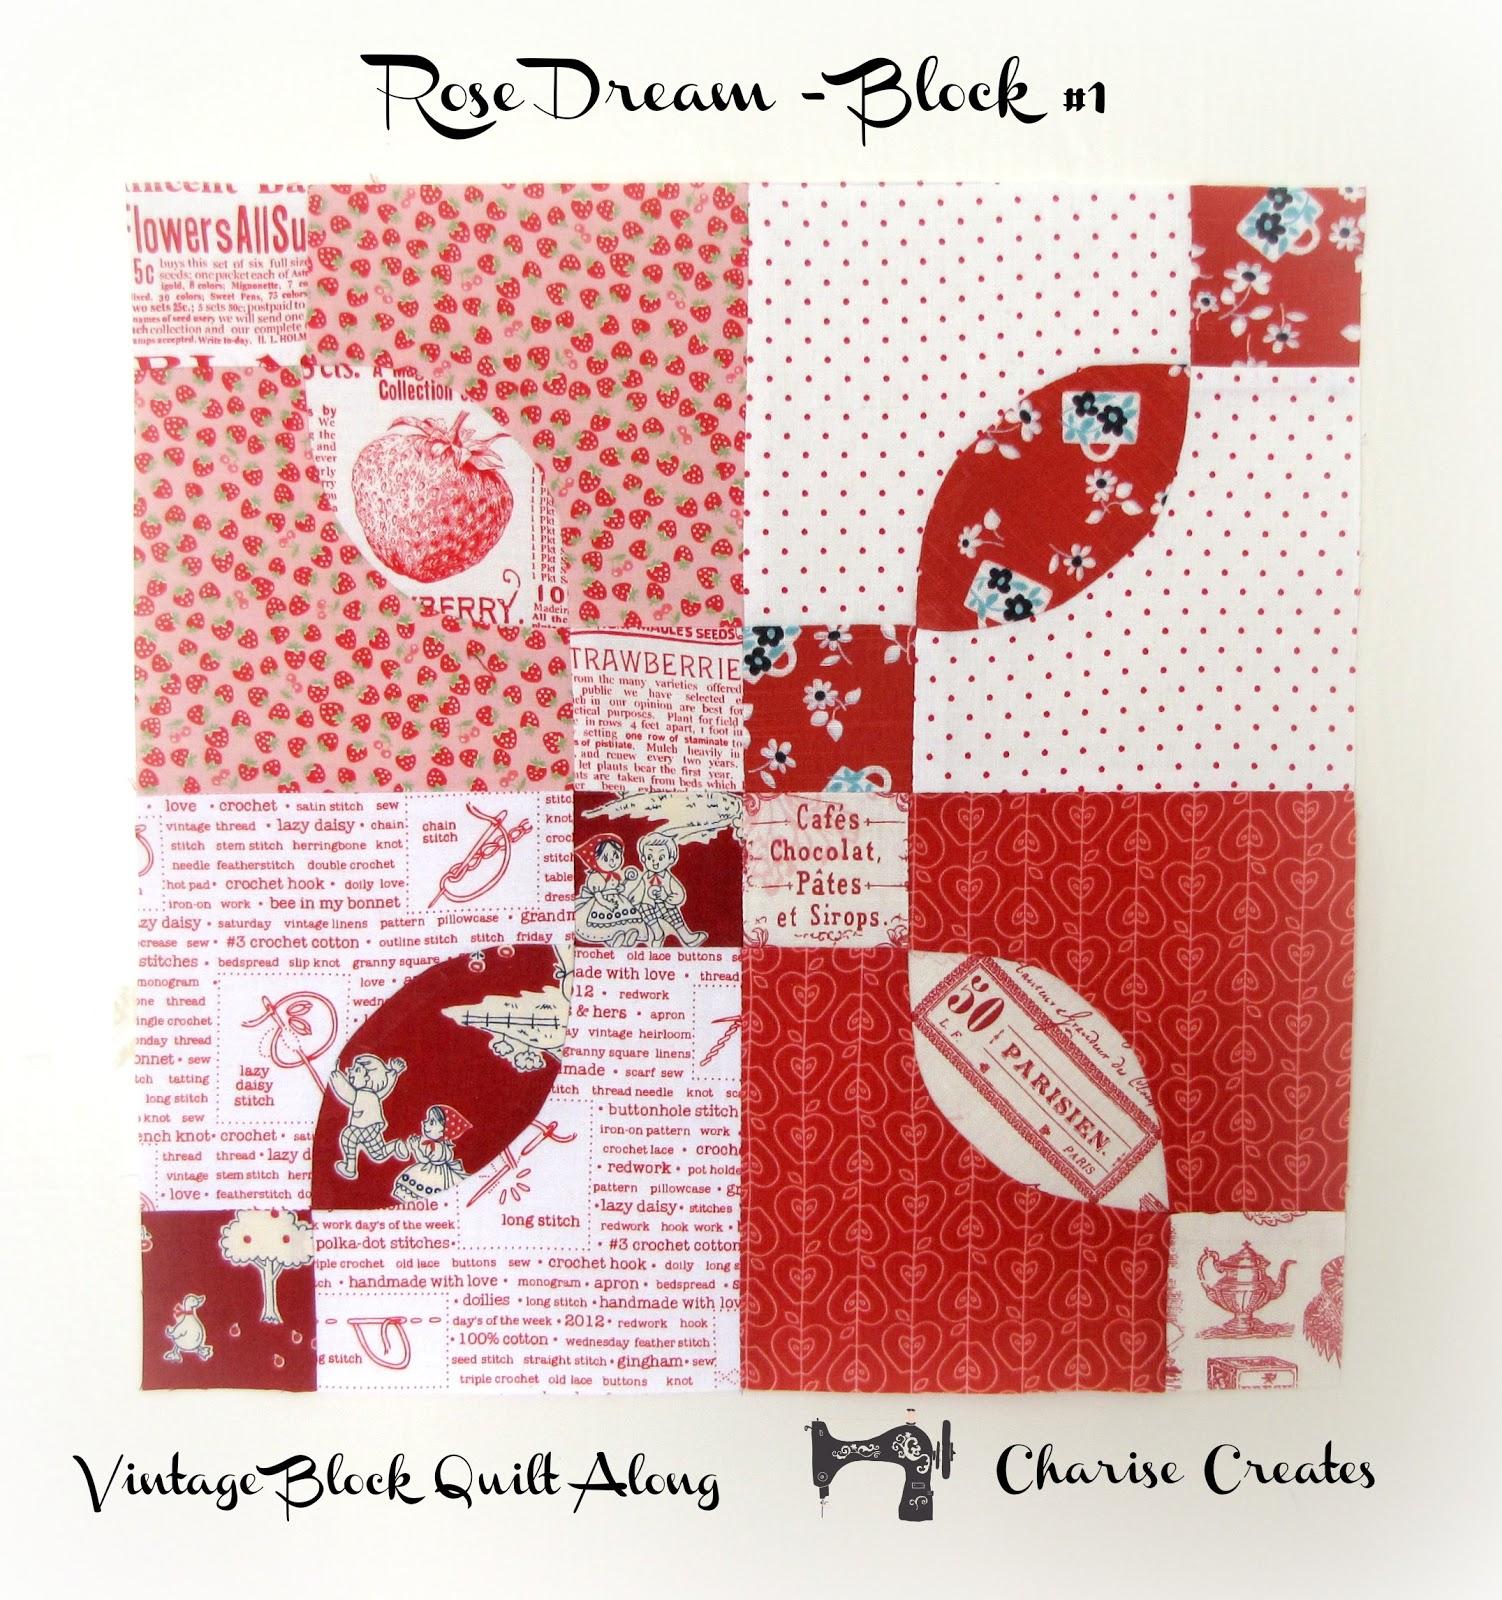 Rose Dream Quilt Block.Charise Creates Vintage Block Quilt Along Block 1 Rose